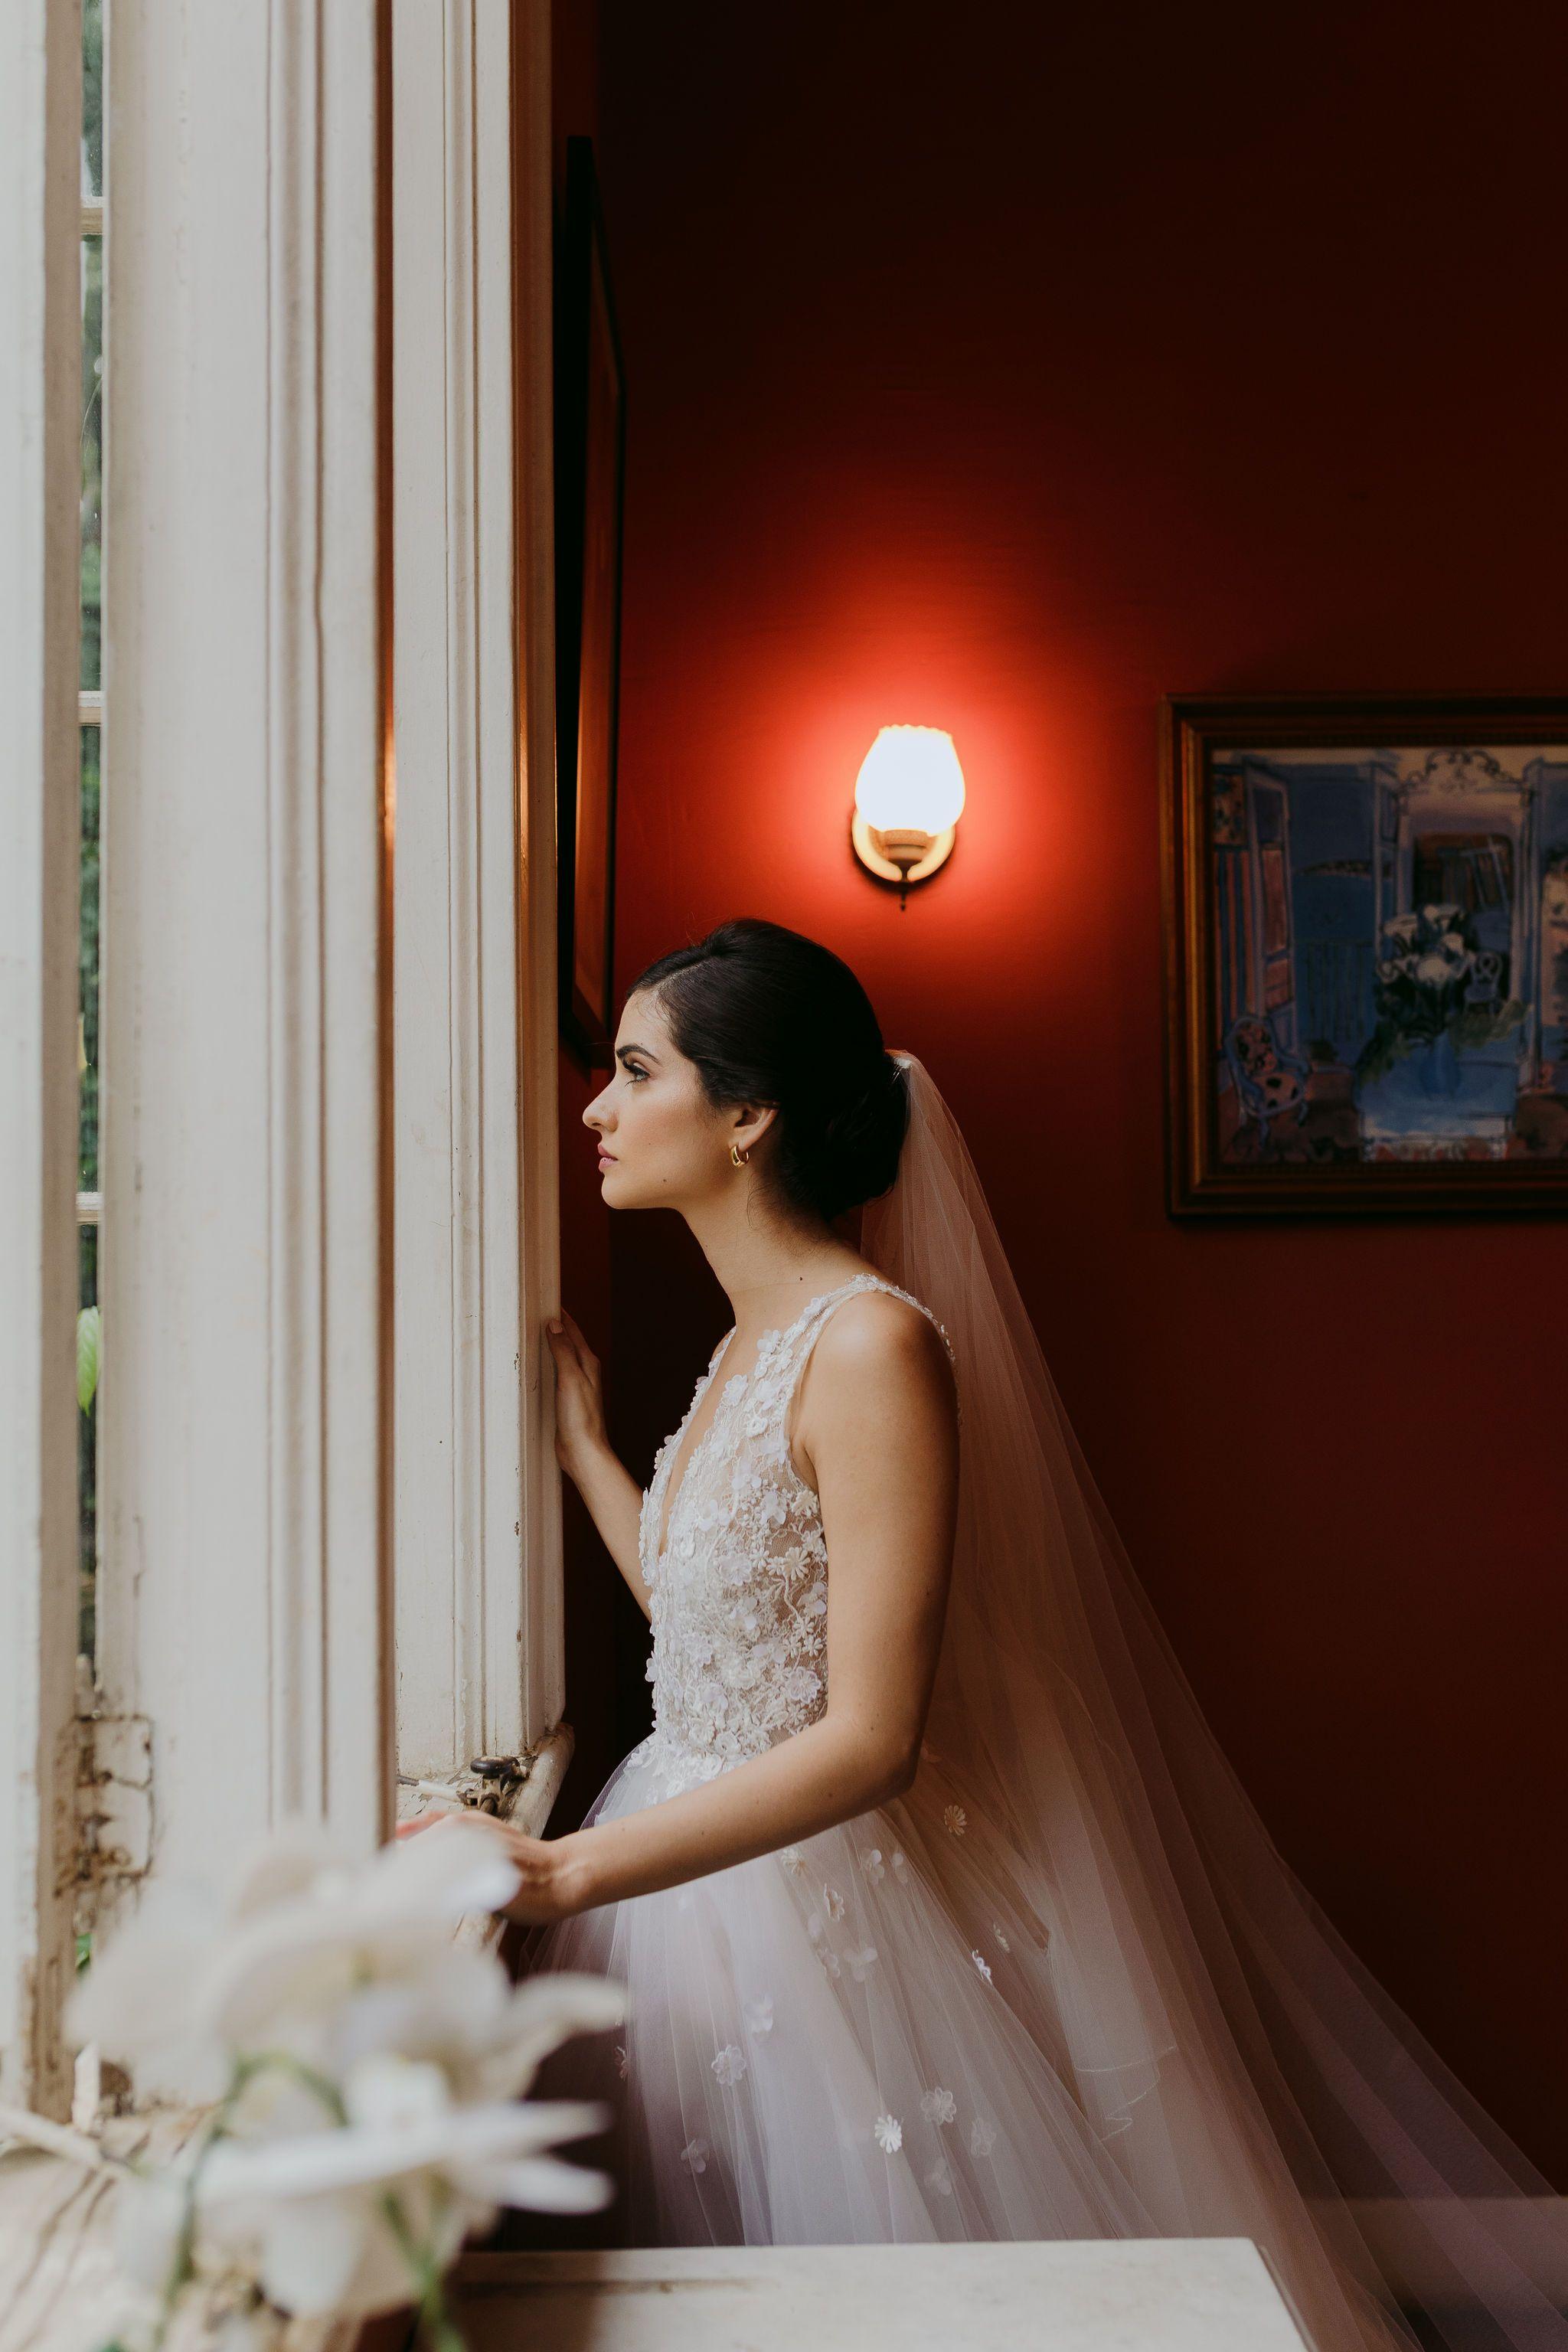 Christian Renee S Luxurious Wedding In Trinidad Tobago Destination Wedding Dress Luxury Wedding Wedding Dress Shopping